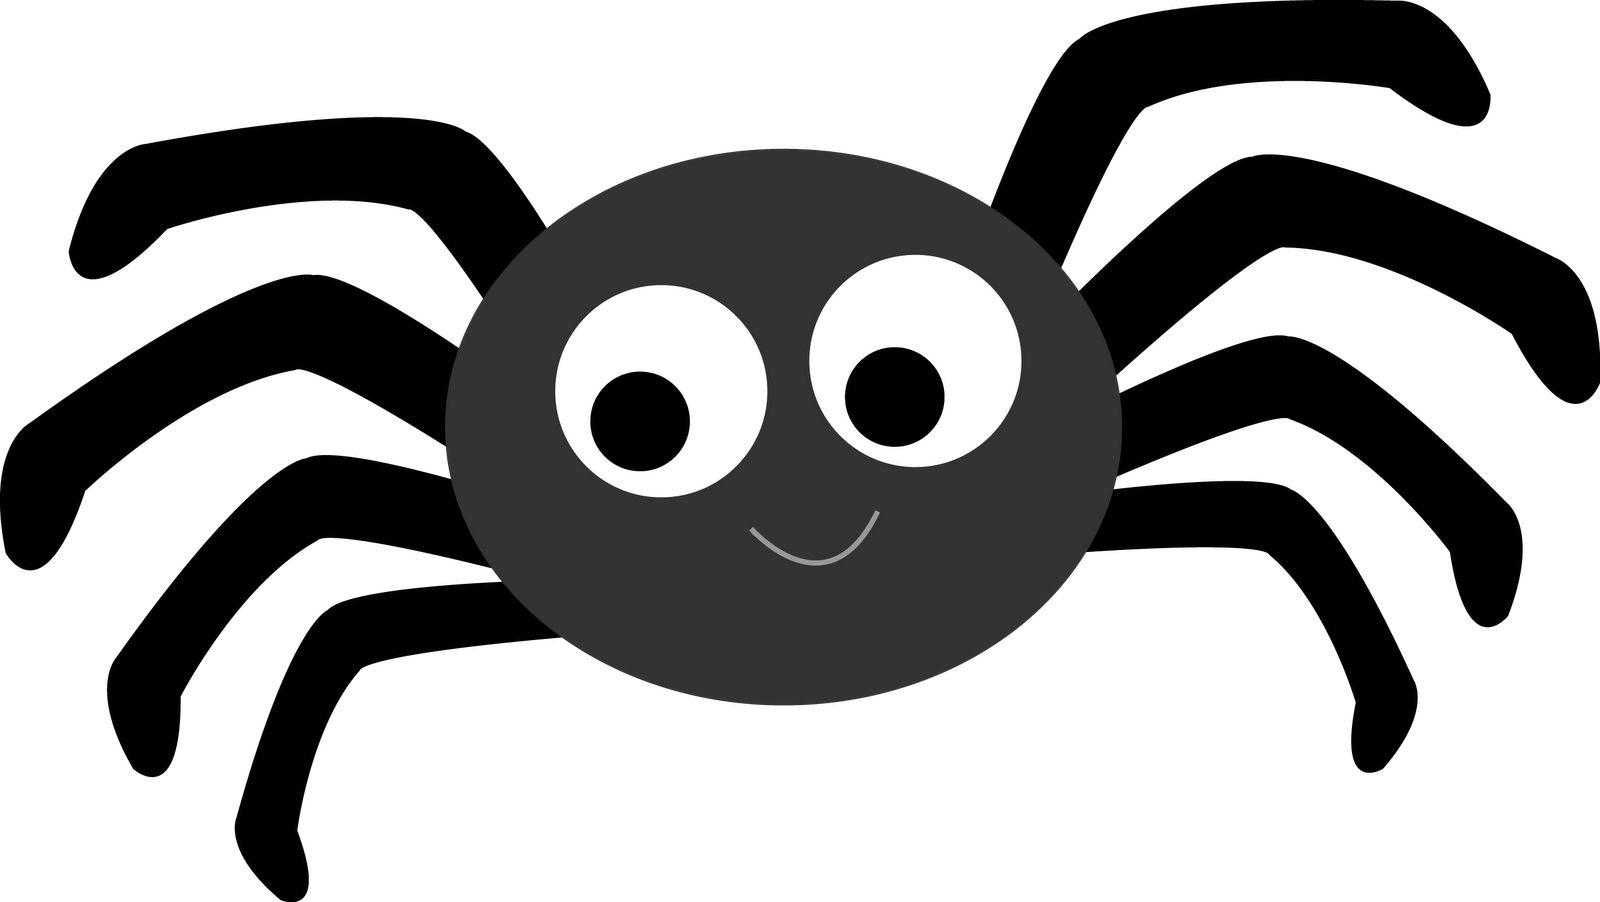 Imagen De Http Images Clipartpanda Com Spider Clipart Etmexrgtn Png Siluetas De Halloween Plantillas De Halloween Dibujos De Halloween